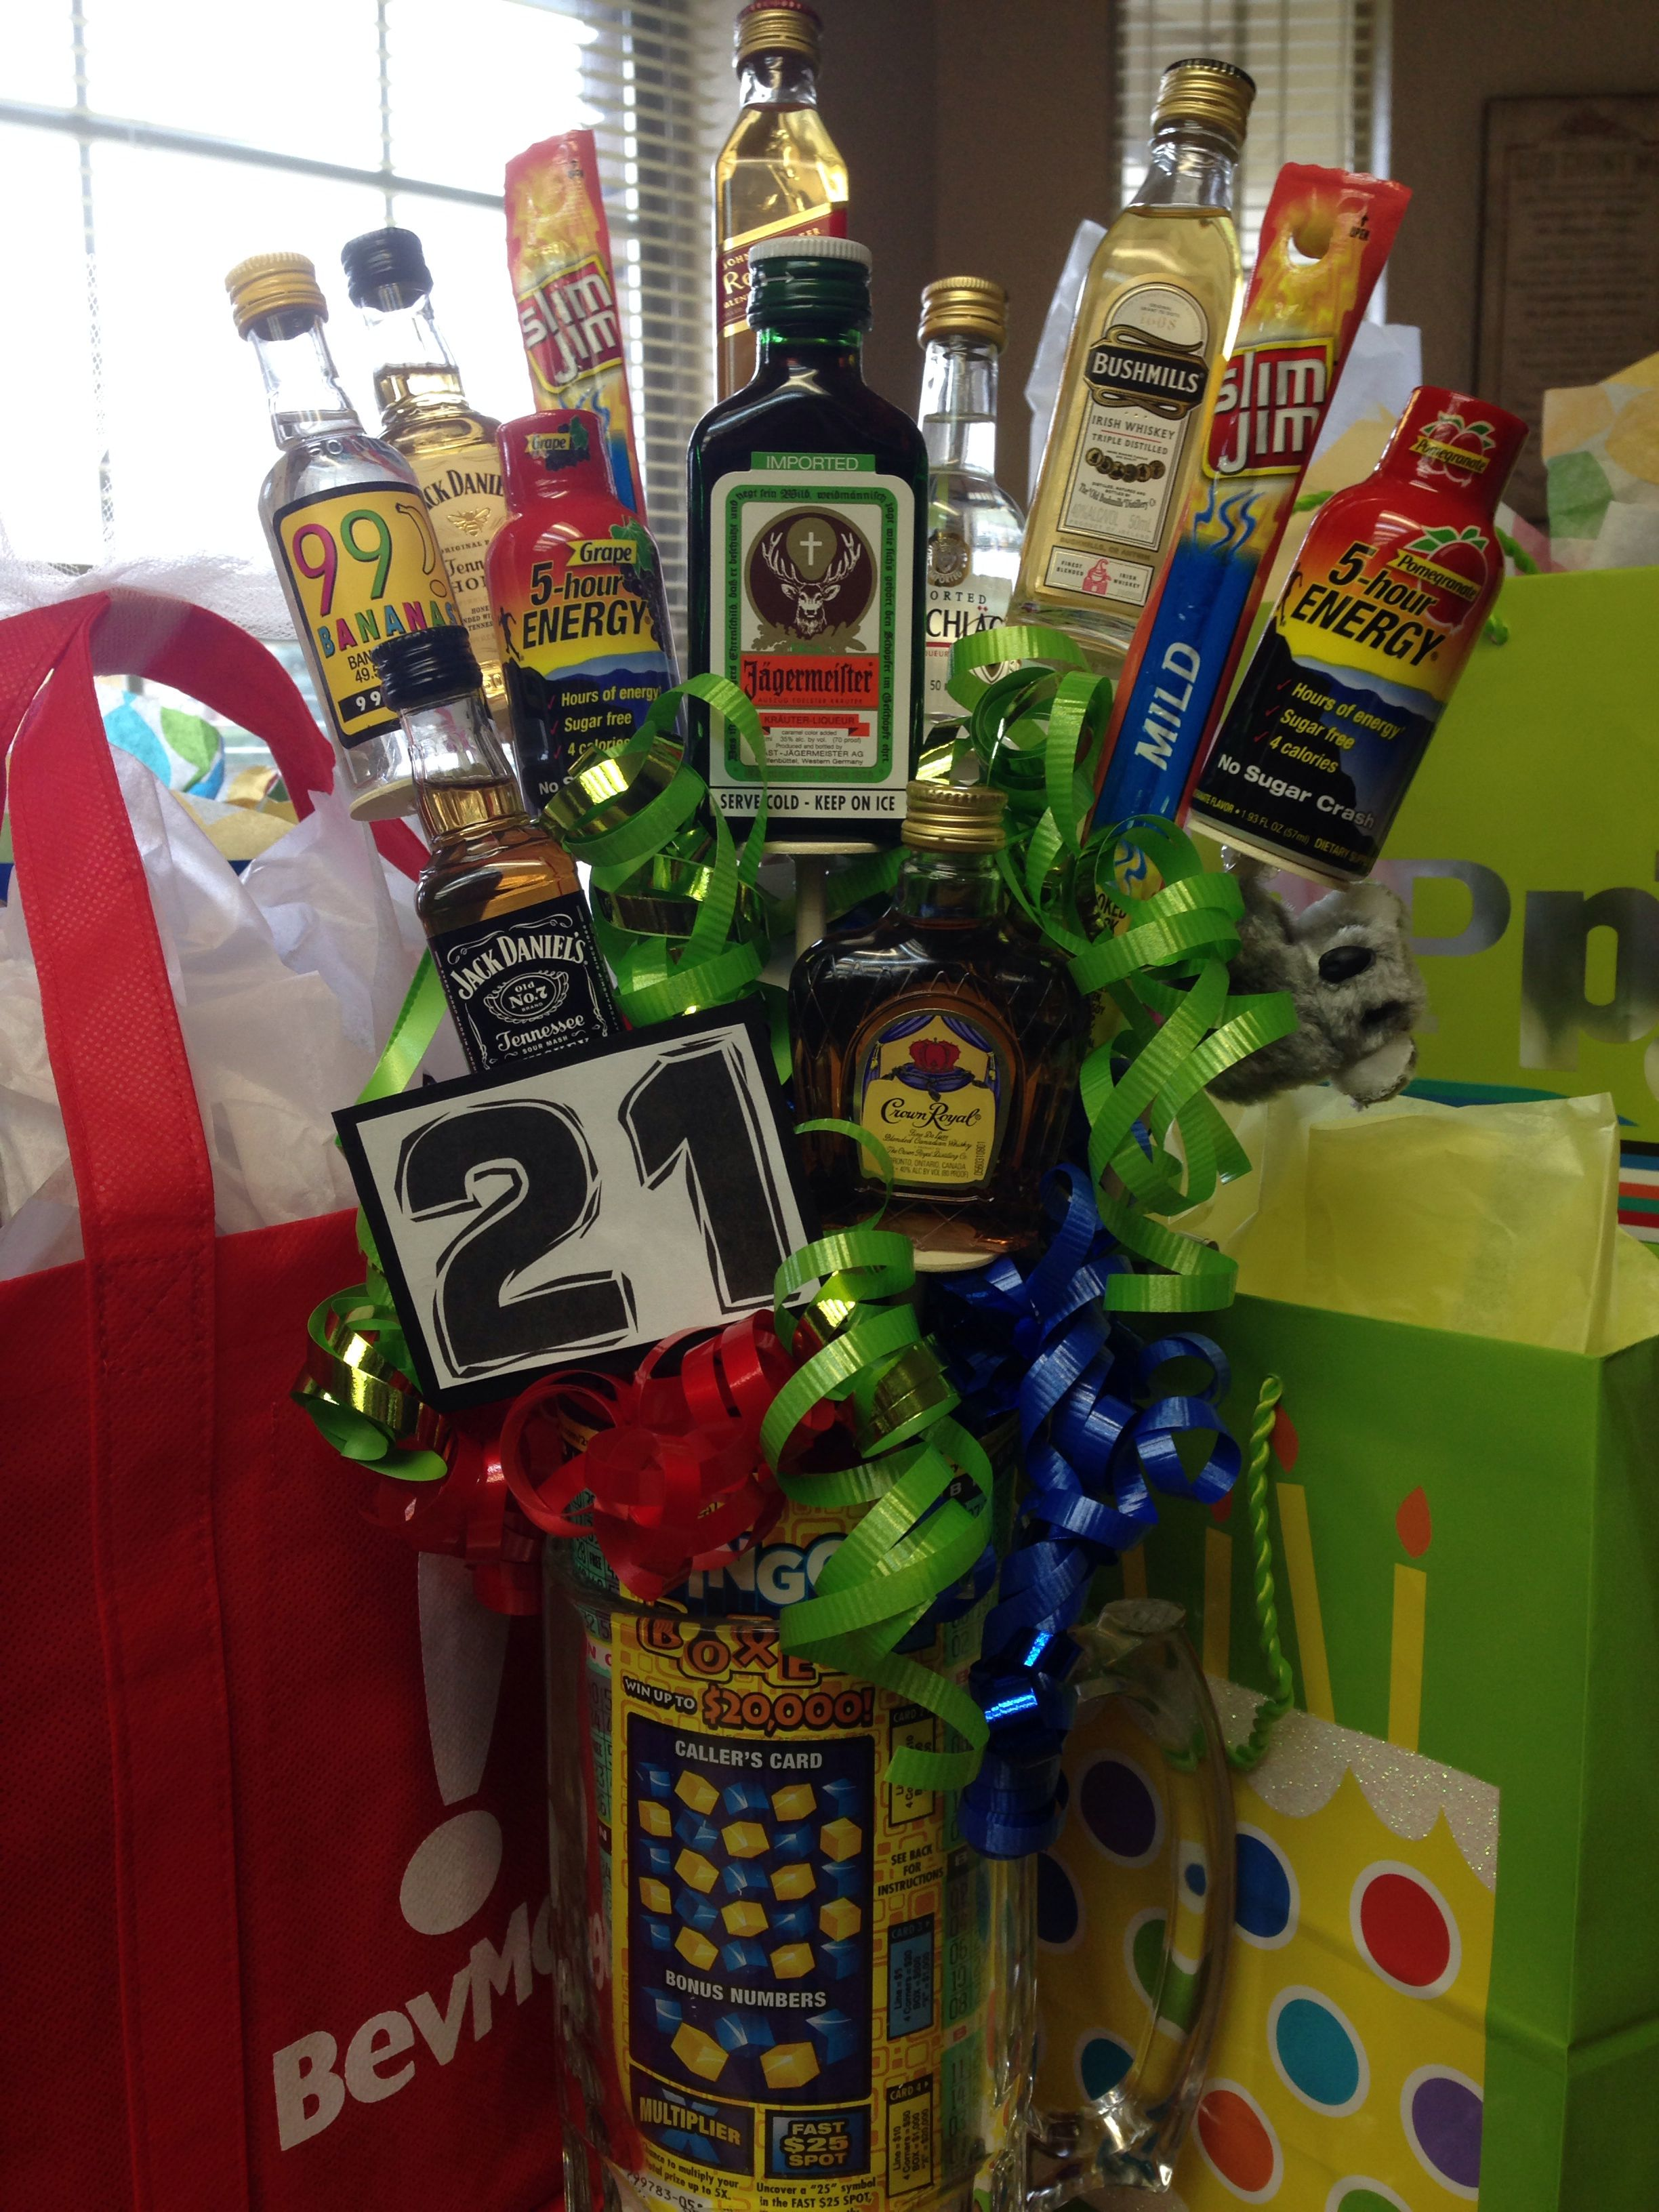 21st birthday gift for guys 21st birthday gifts diy